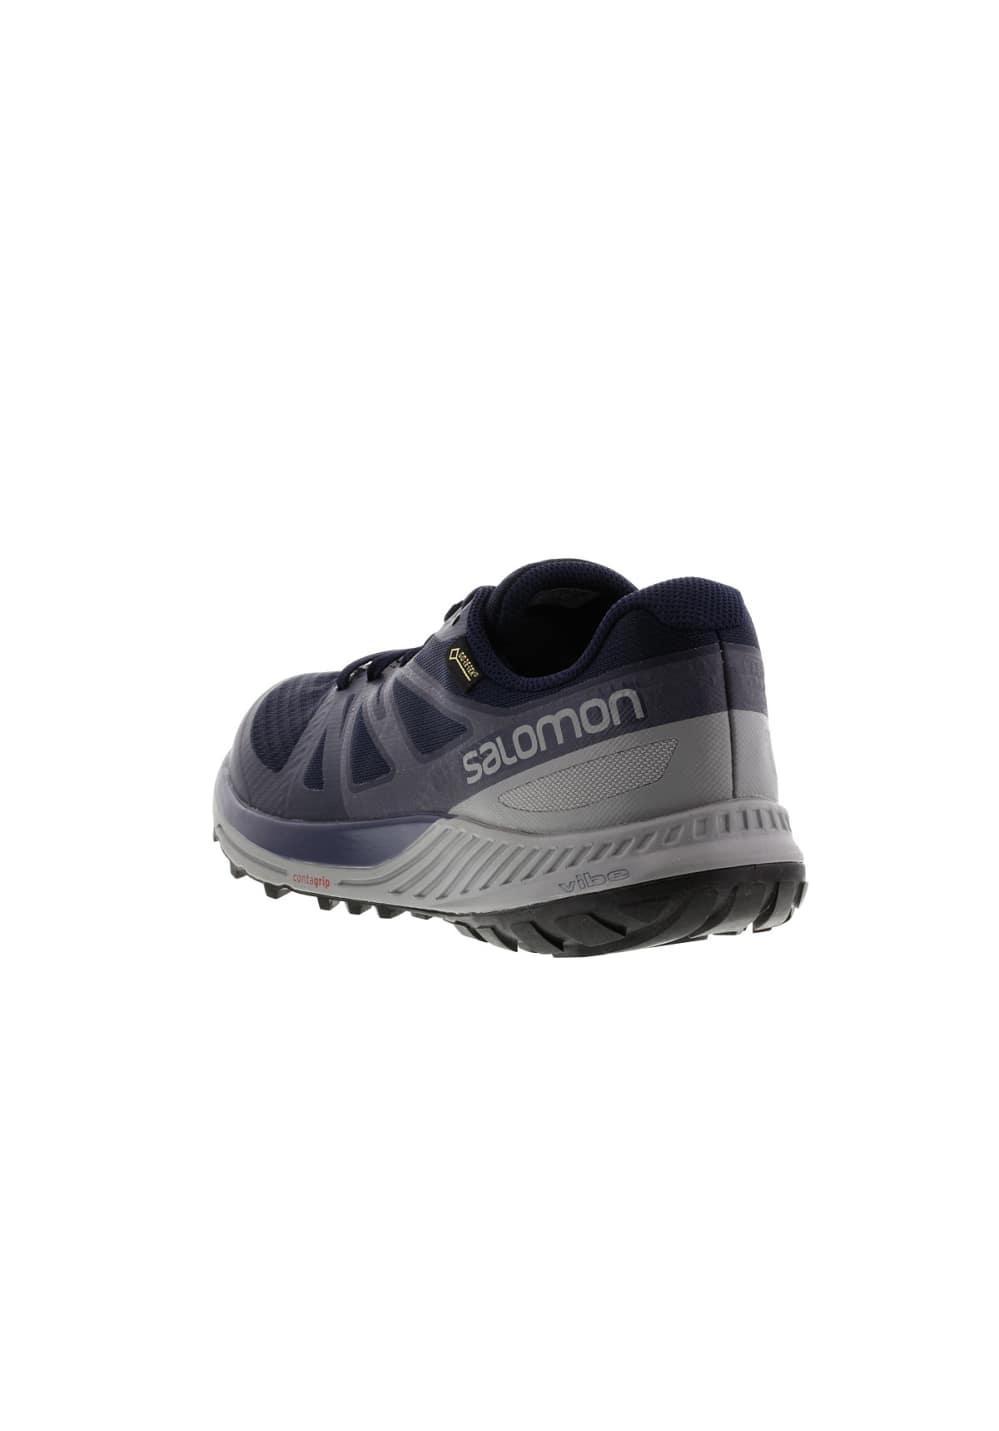 Running Chaussures Noir Salomon Sense Homme 21run Gtx Pour Escape Rt070qI